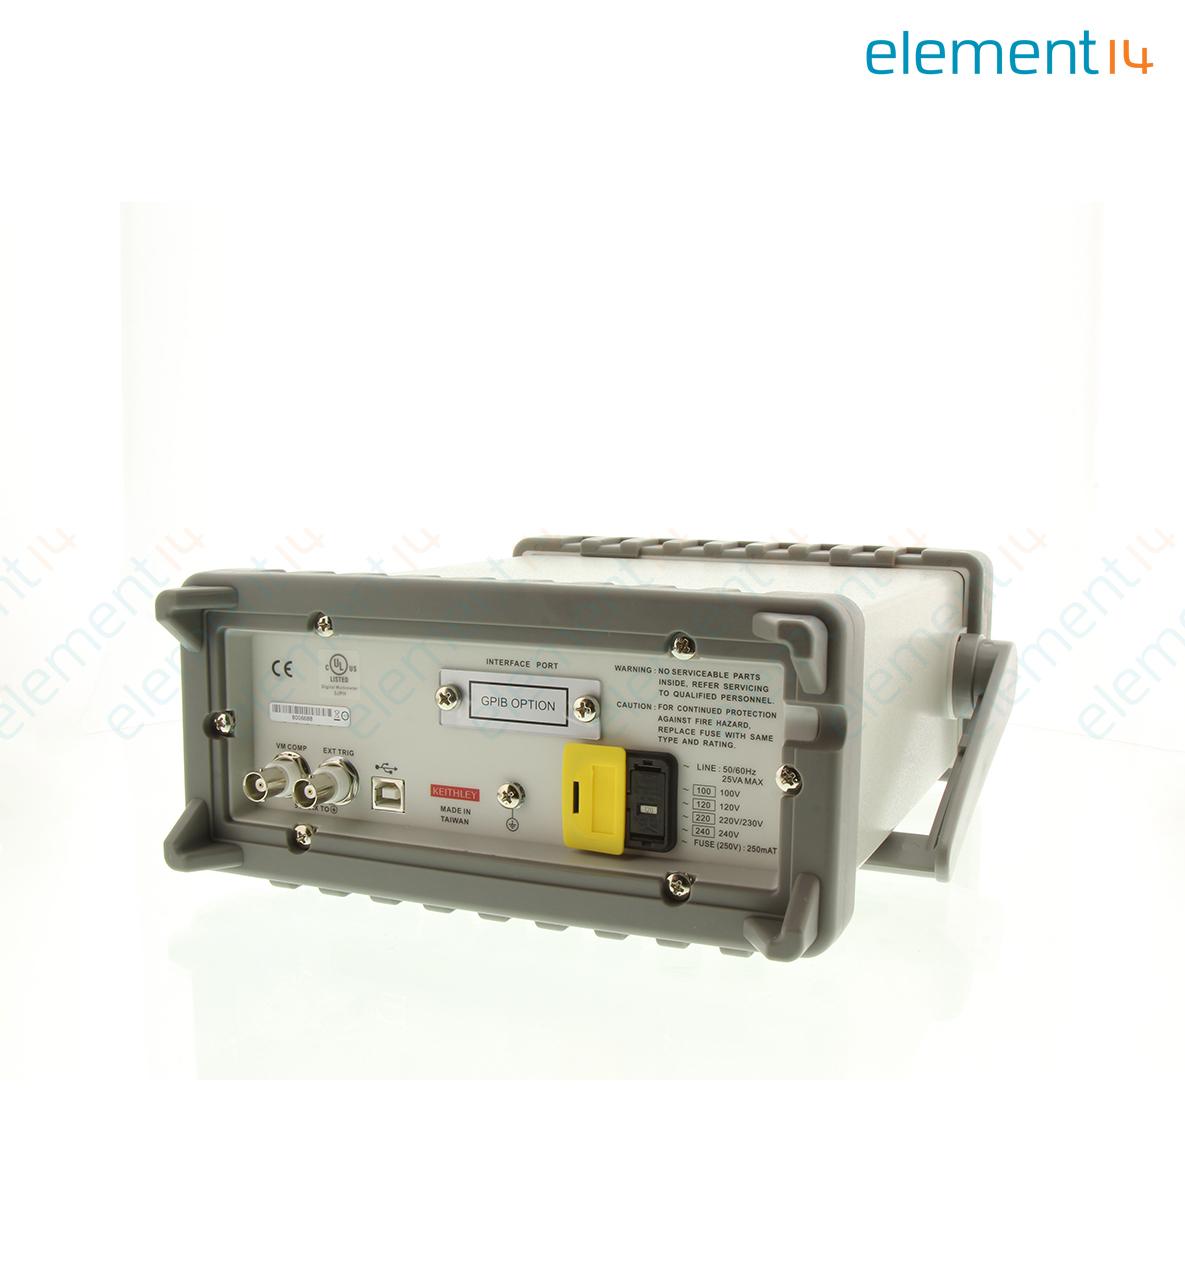 Bench Dmm: Bench Digital Multimeter, True RMS, Auto